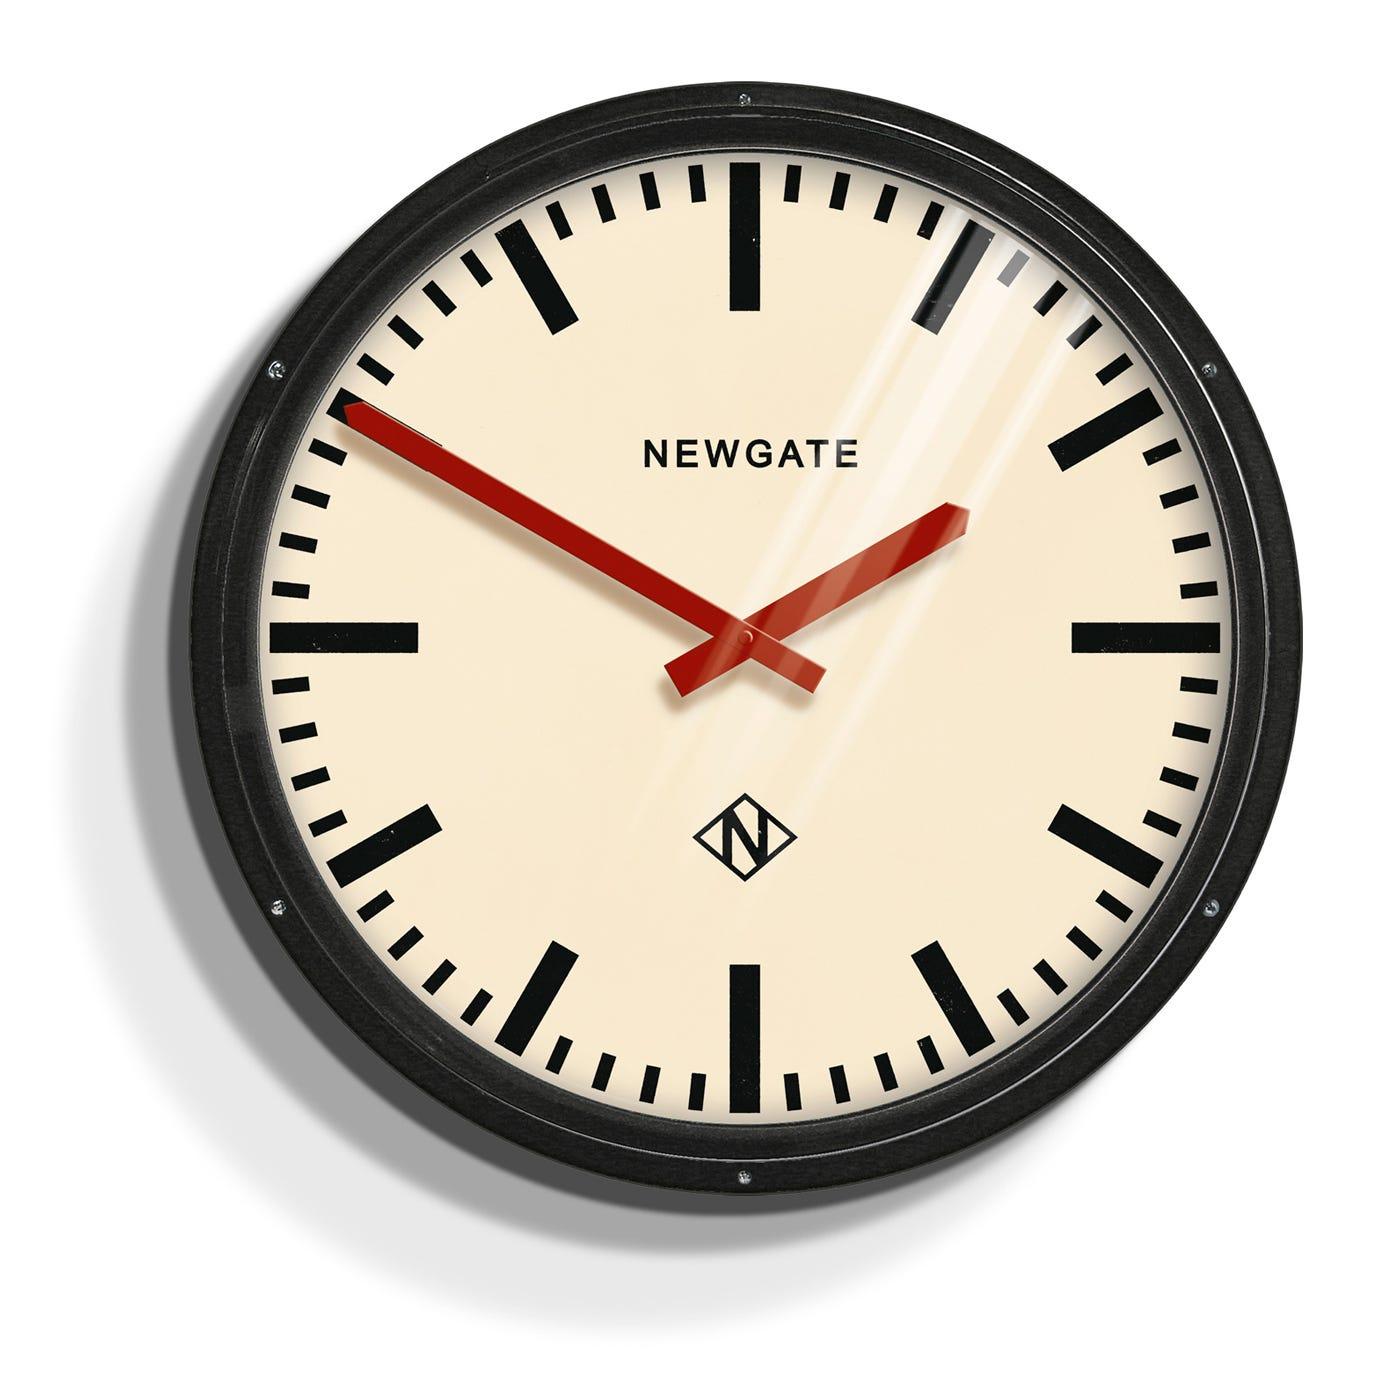 newgate metropolitan black wall clock - metropolitan black wall clock